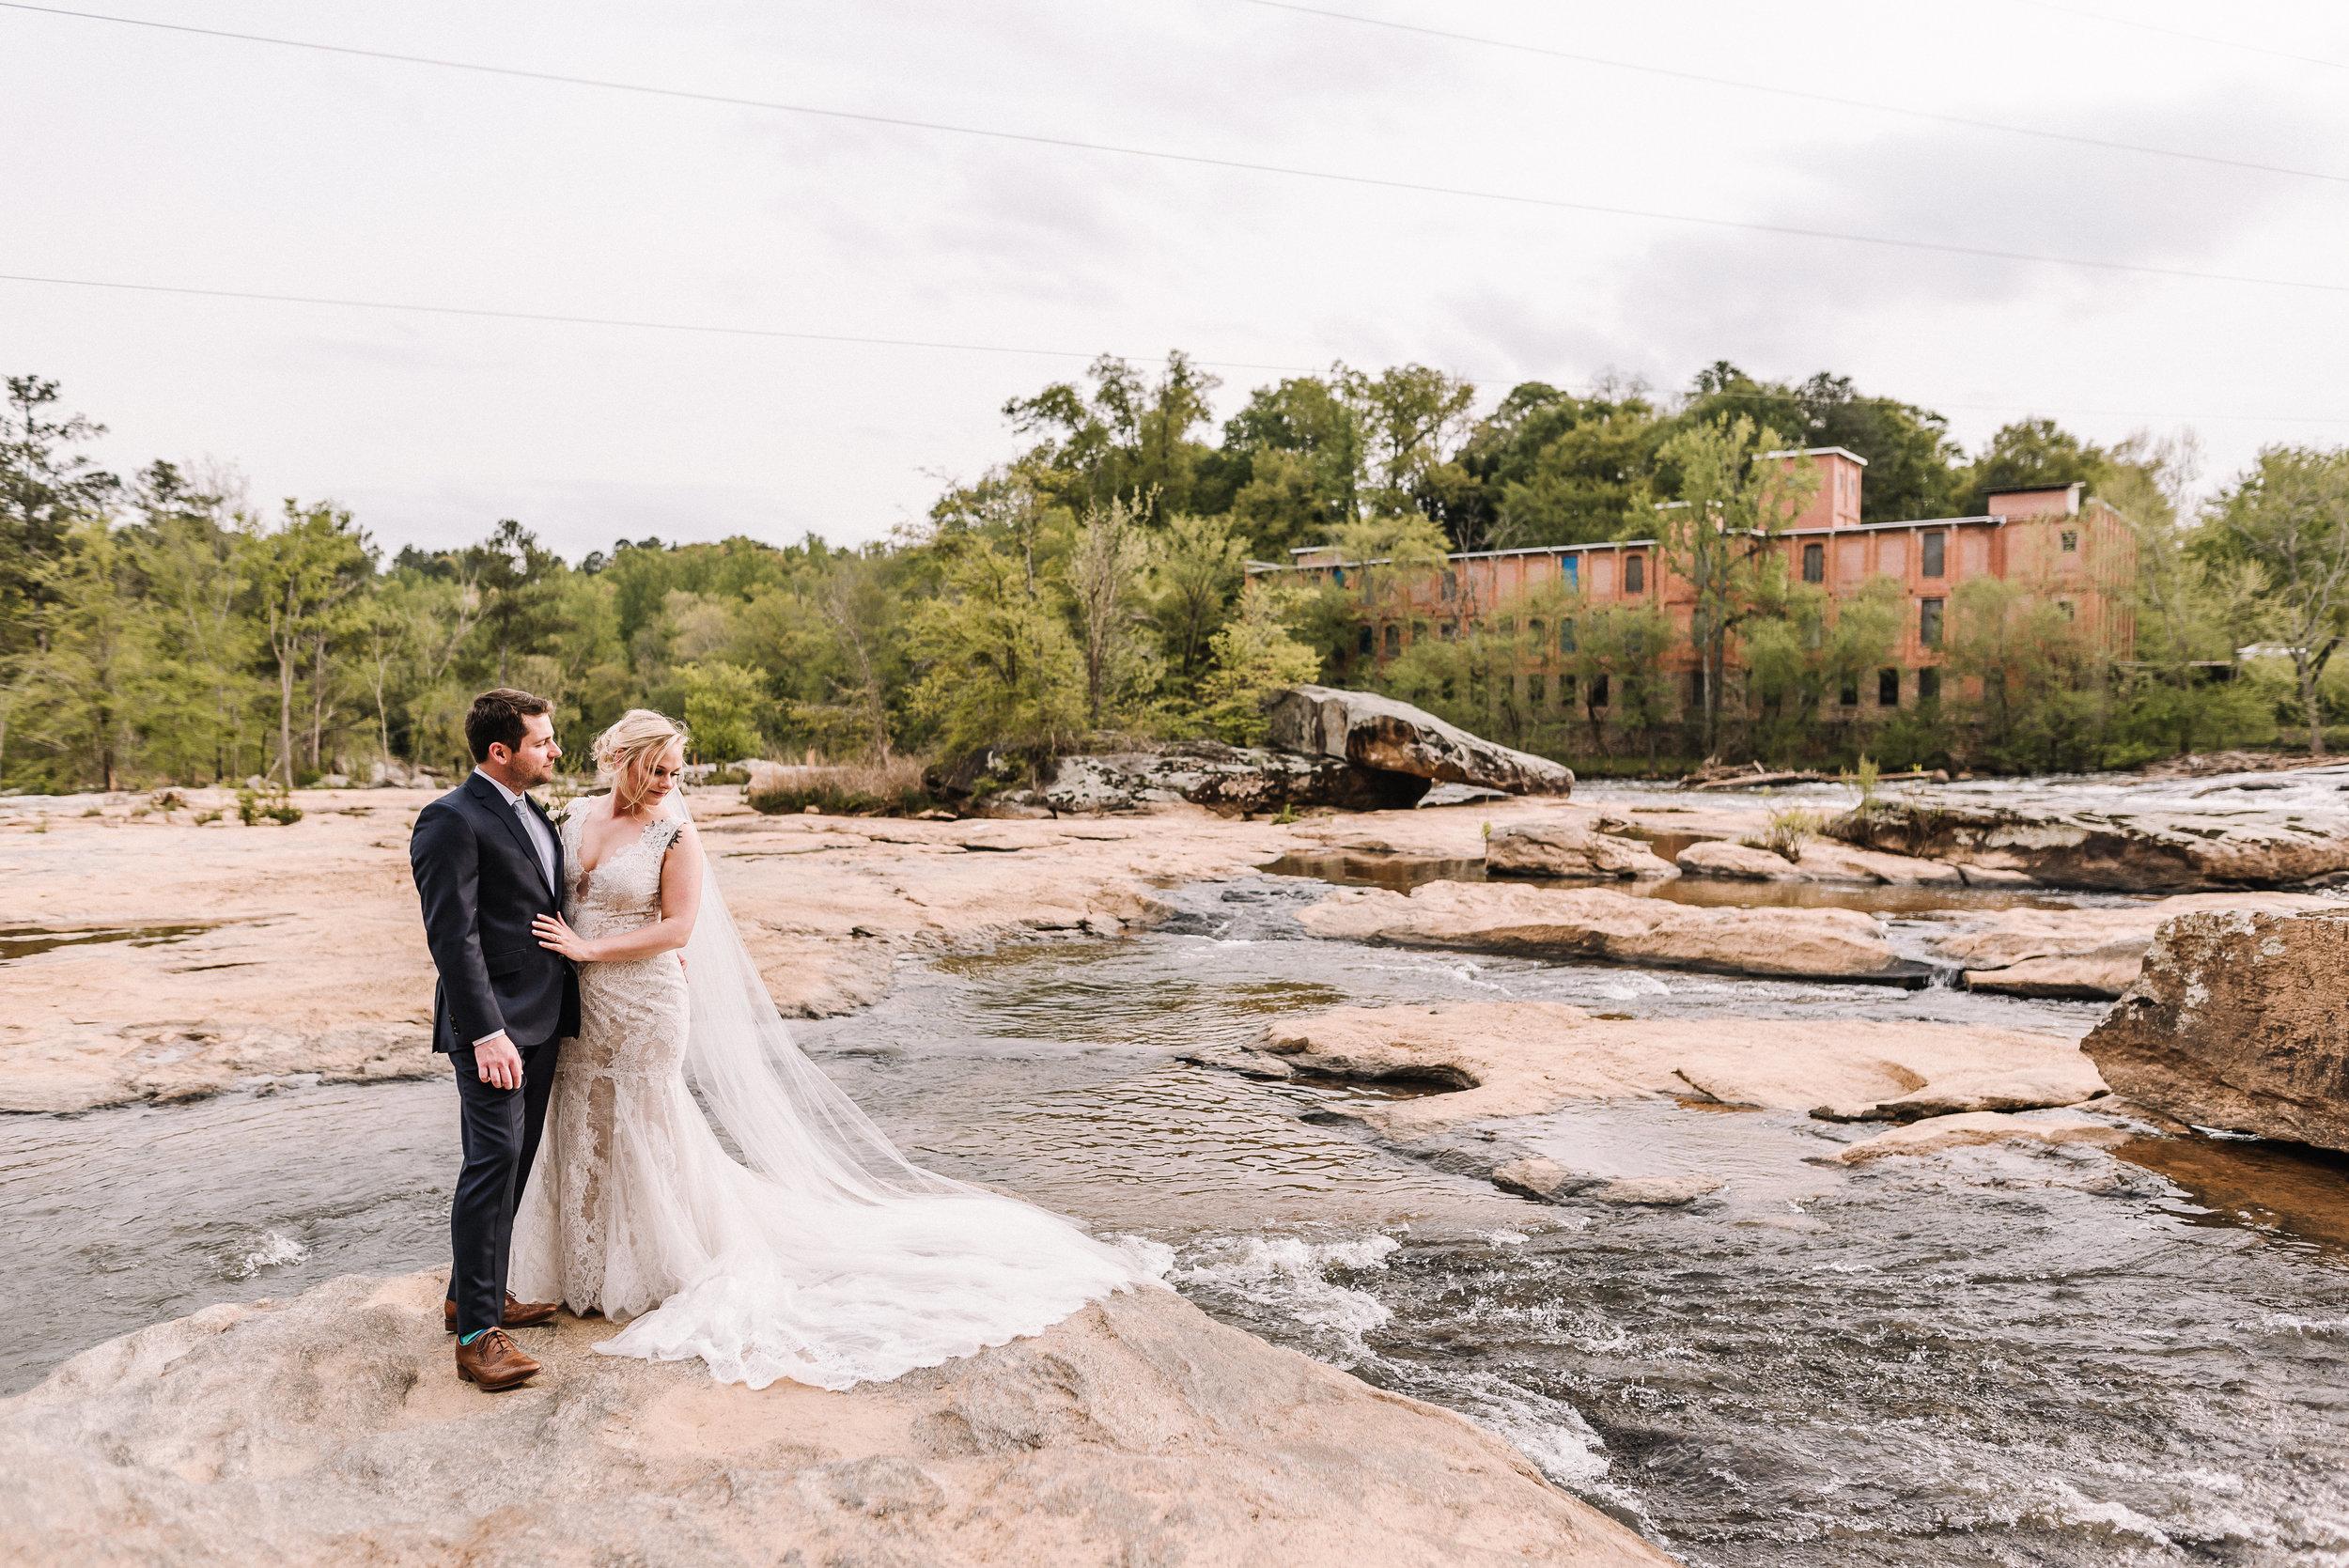 Morgan Wedding_Mill at Yellow River_Ashley Benham Photography-896.jpg